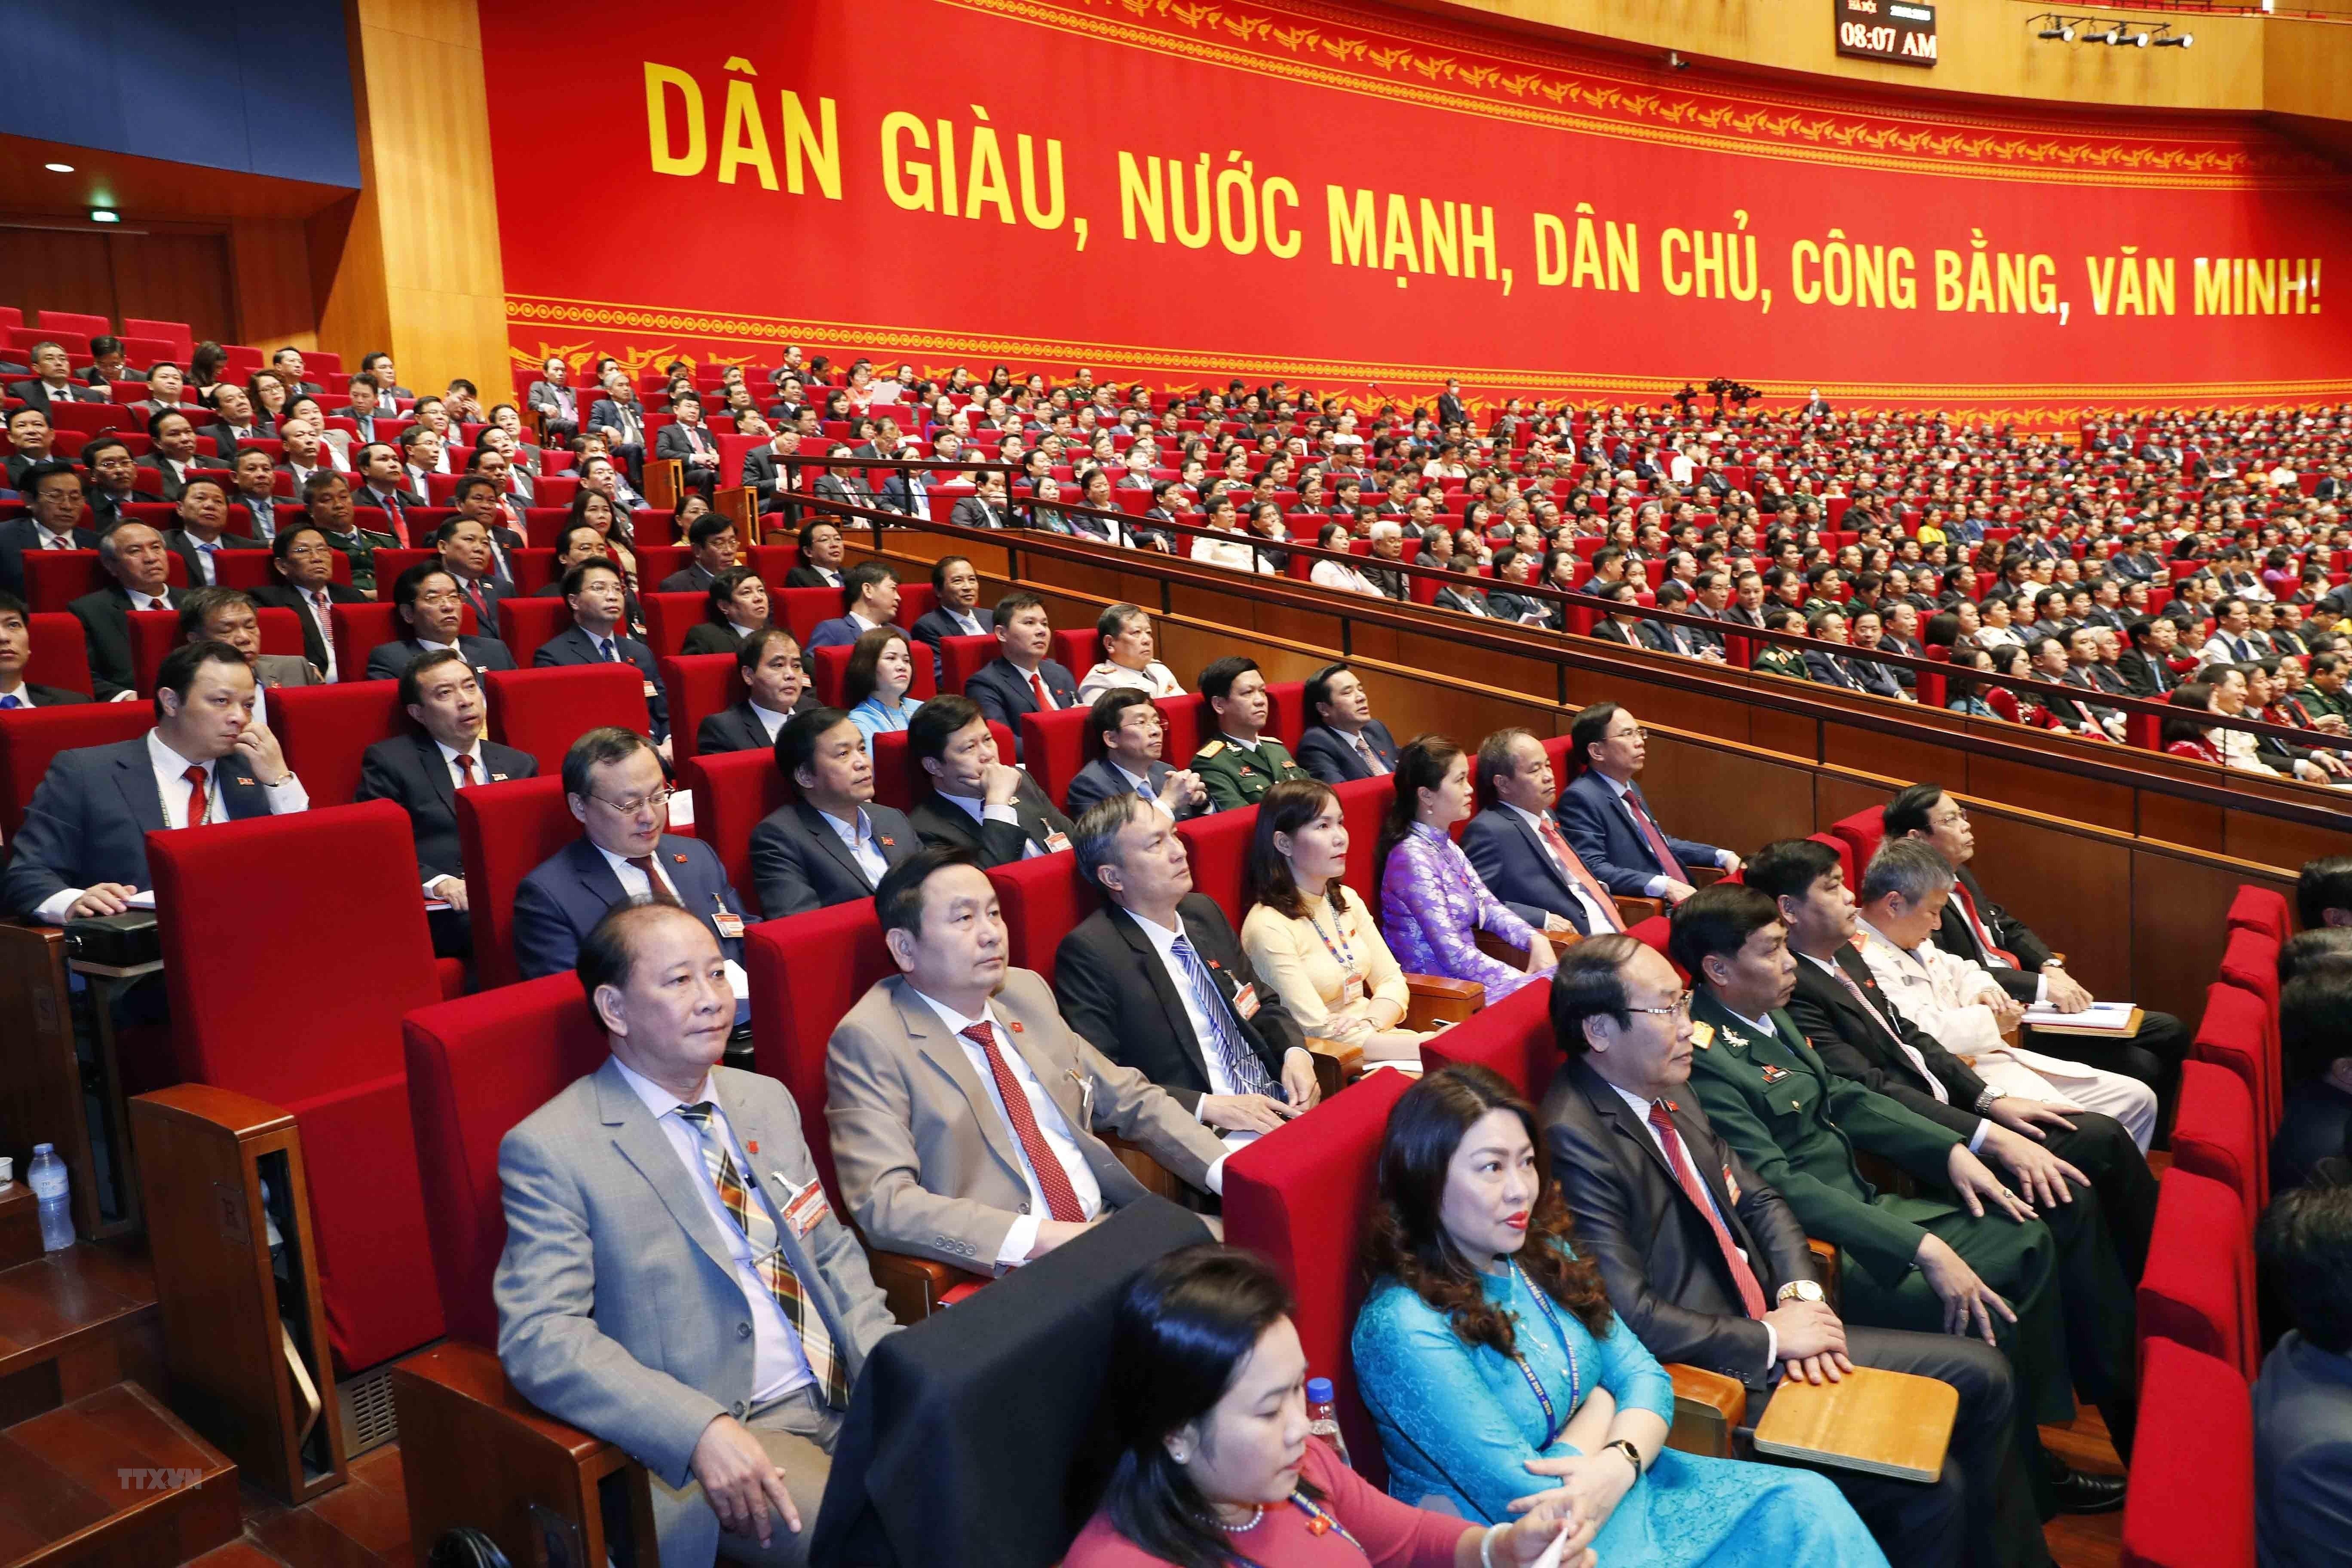 [Photo] Quang canh phien thao luan cac van kien Dai hoi XIII cua Dang hinh anh 25